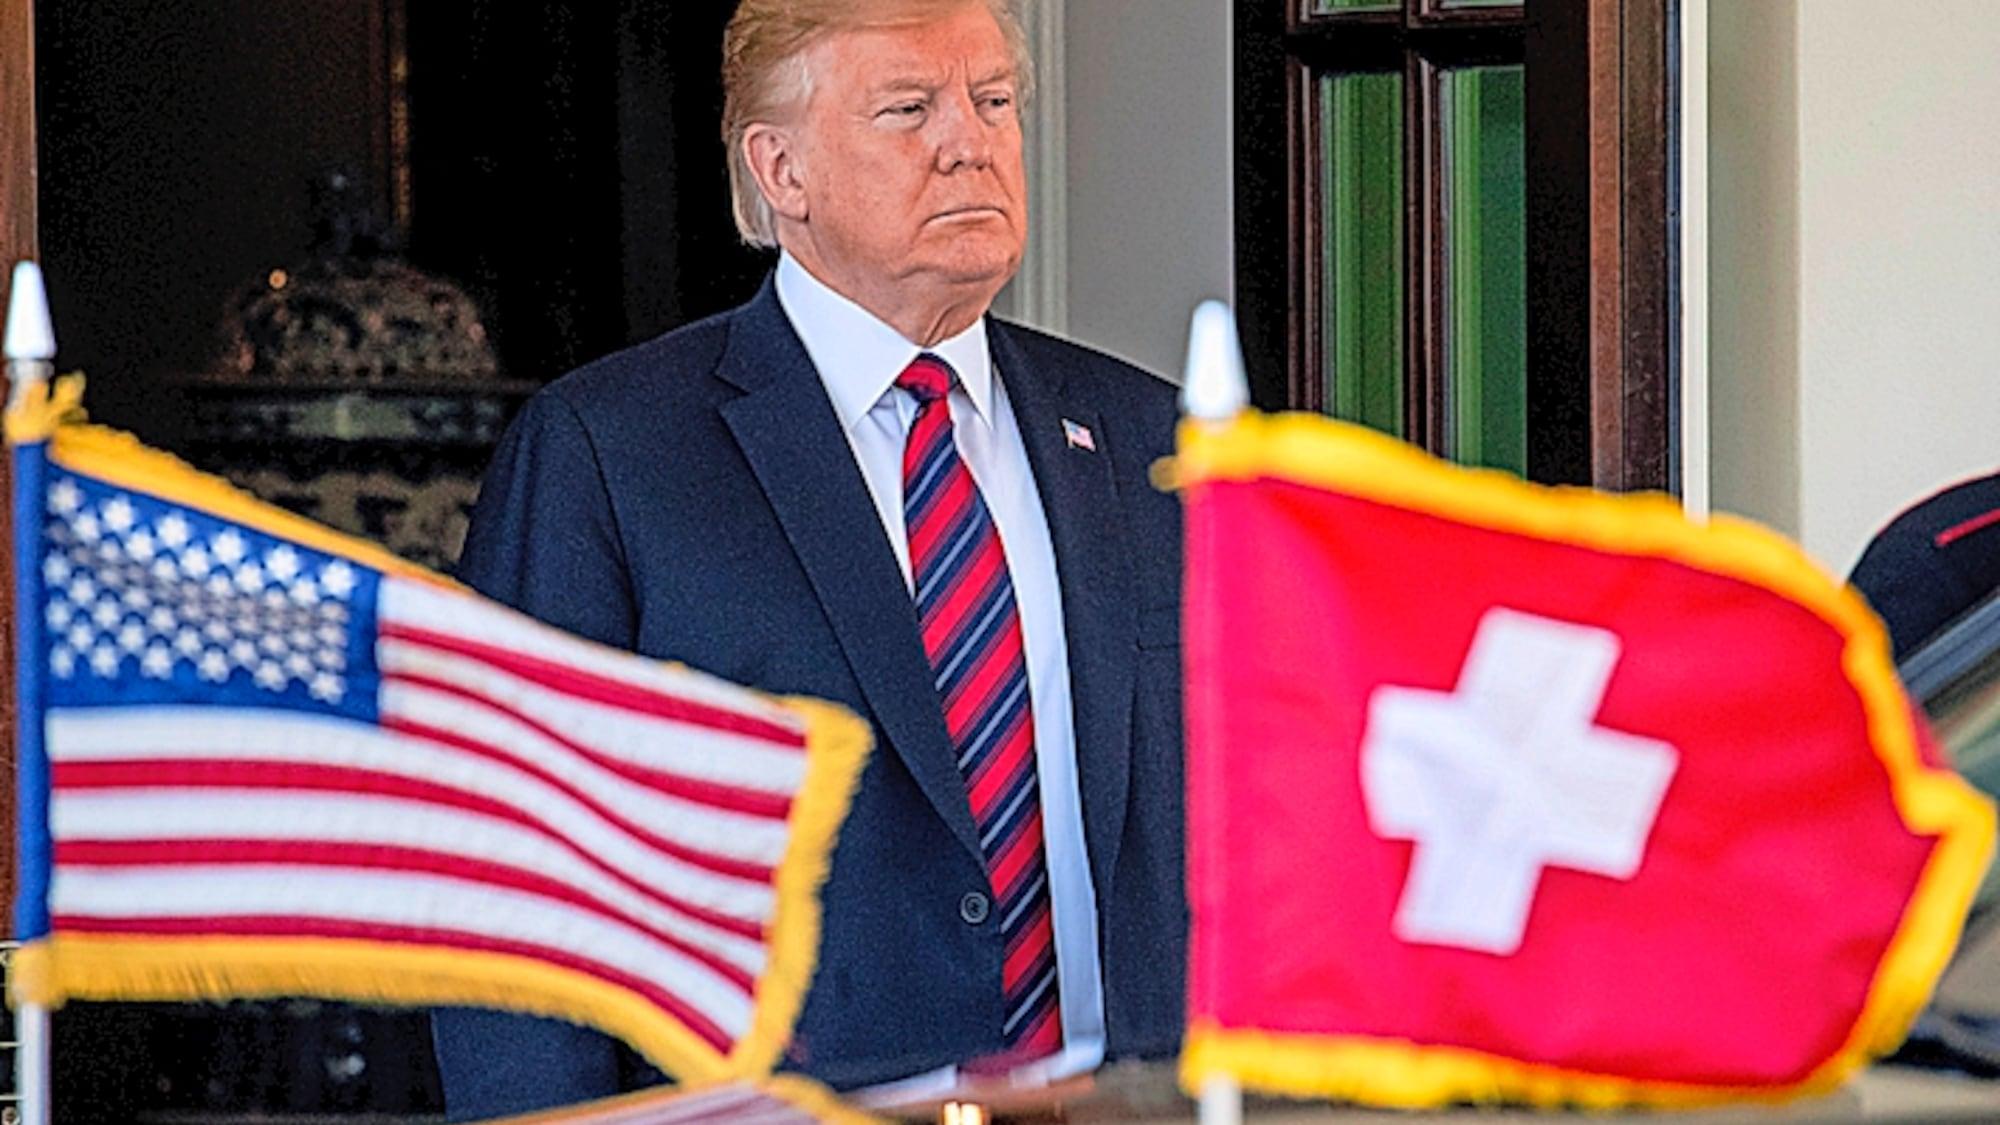 Darum war Ueli Maurer wirklich bei Donald Trump: Schweiz soll US-Bürger schützen